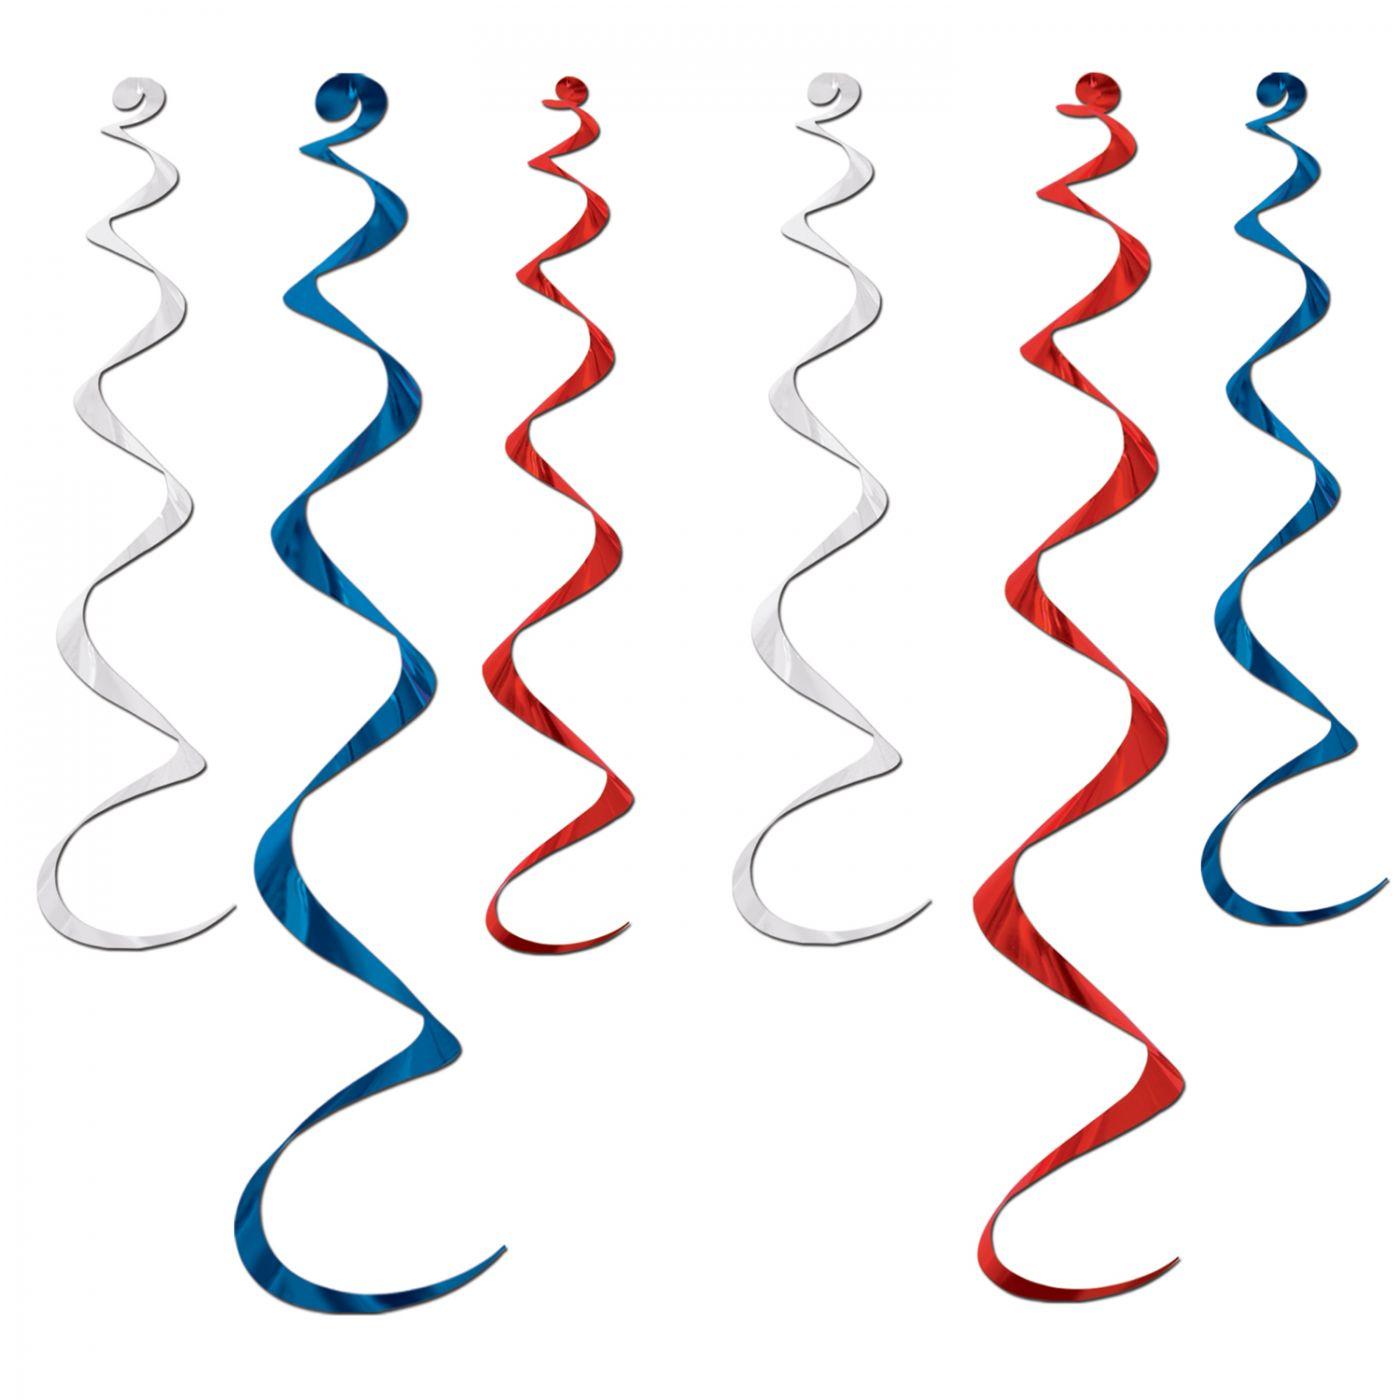 Twirly Whirlys (6) image